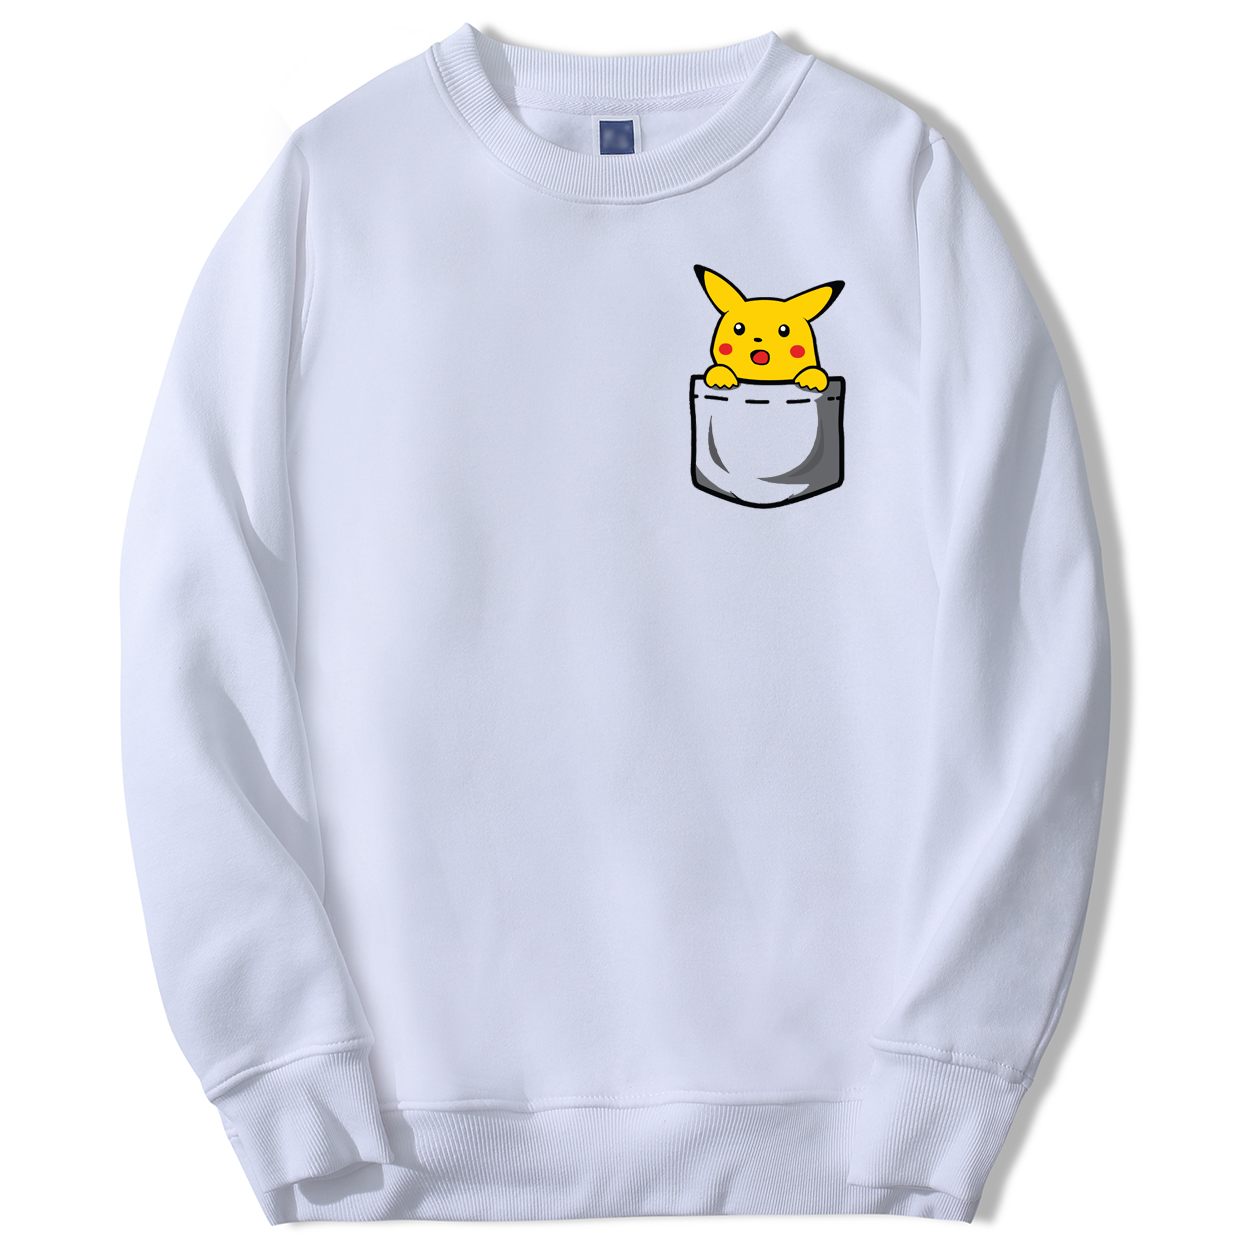 Pokemon Japan Anime Men's Sweatshirts Pikachu Male Hoodies Sweatshirts 2020 Spring Autumn Hoodies Harajuku Sweatshirt Man Tops